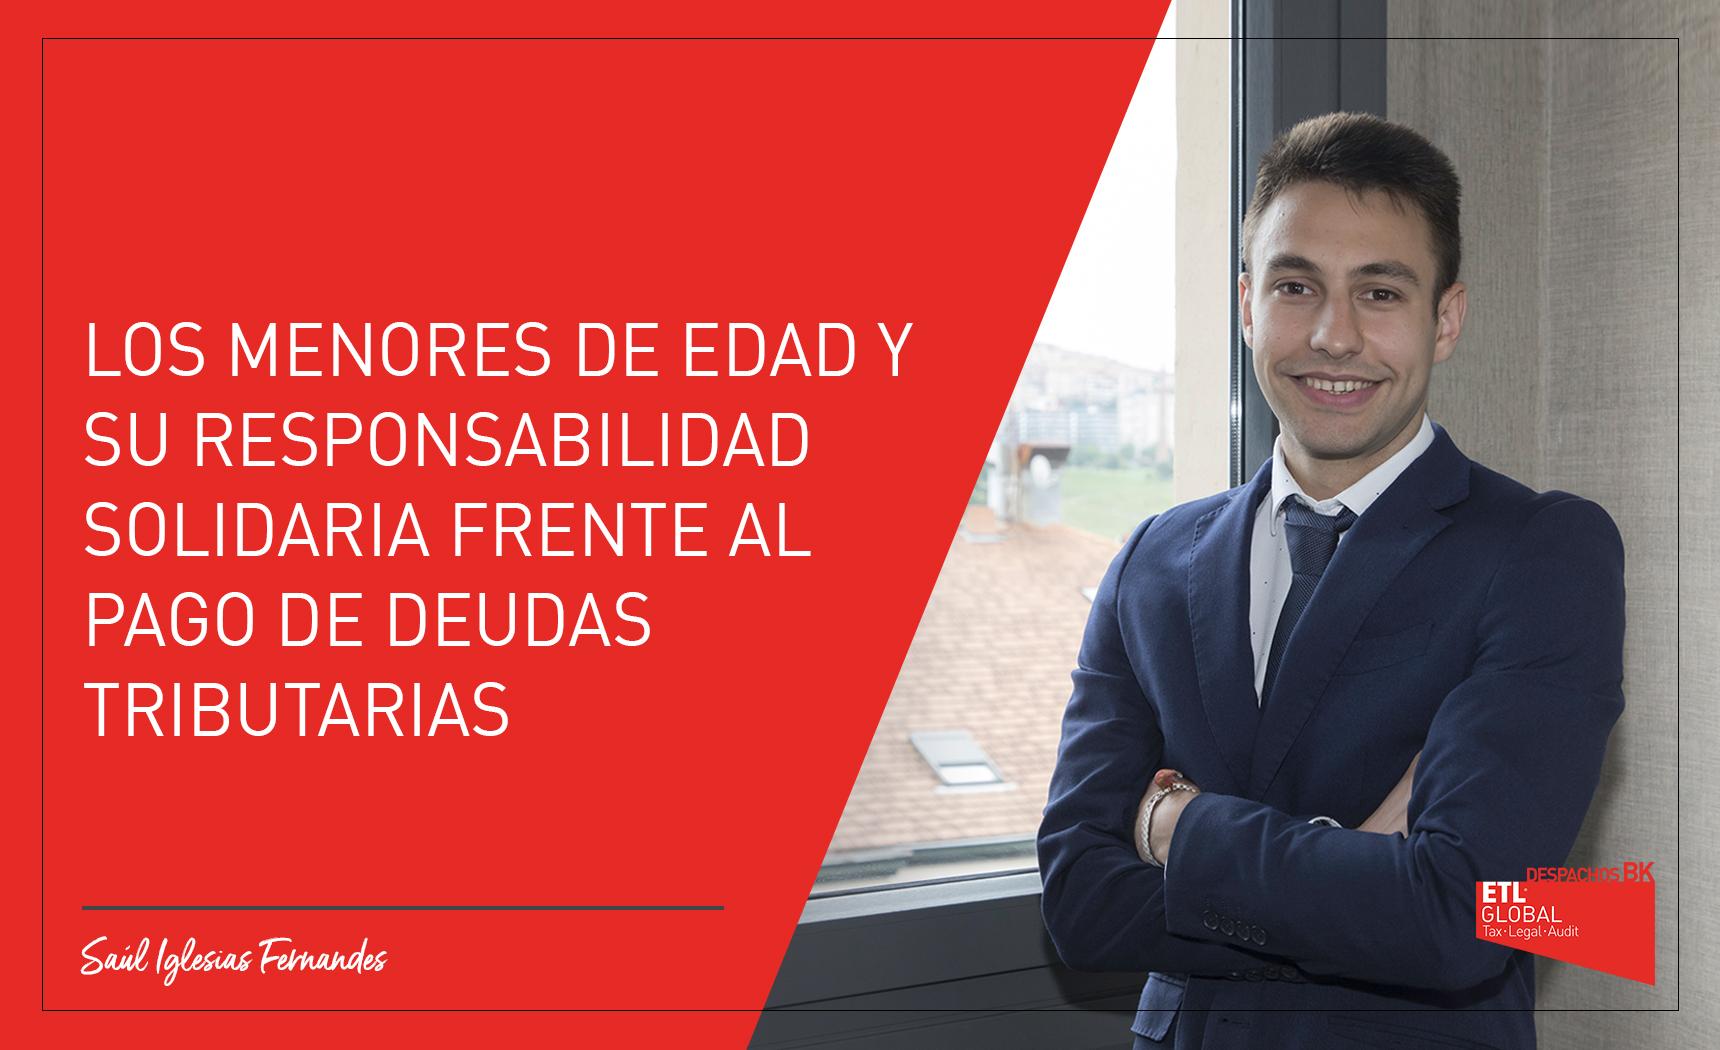 menores pago deudas tributarias - Saúl Iglesias - Despachos BK GA ETL Global